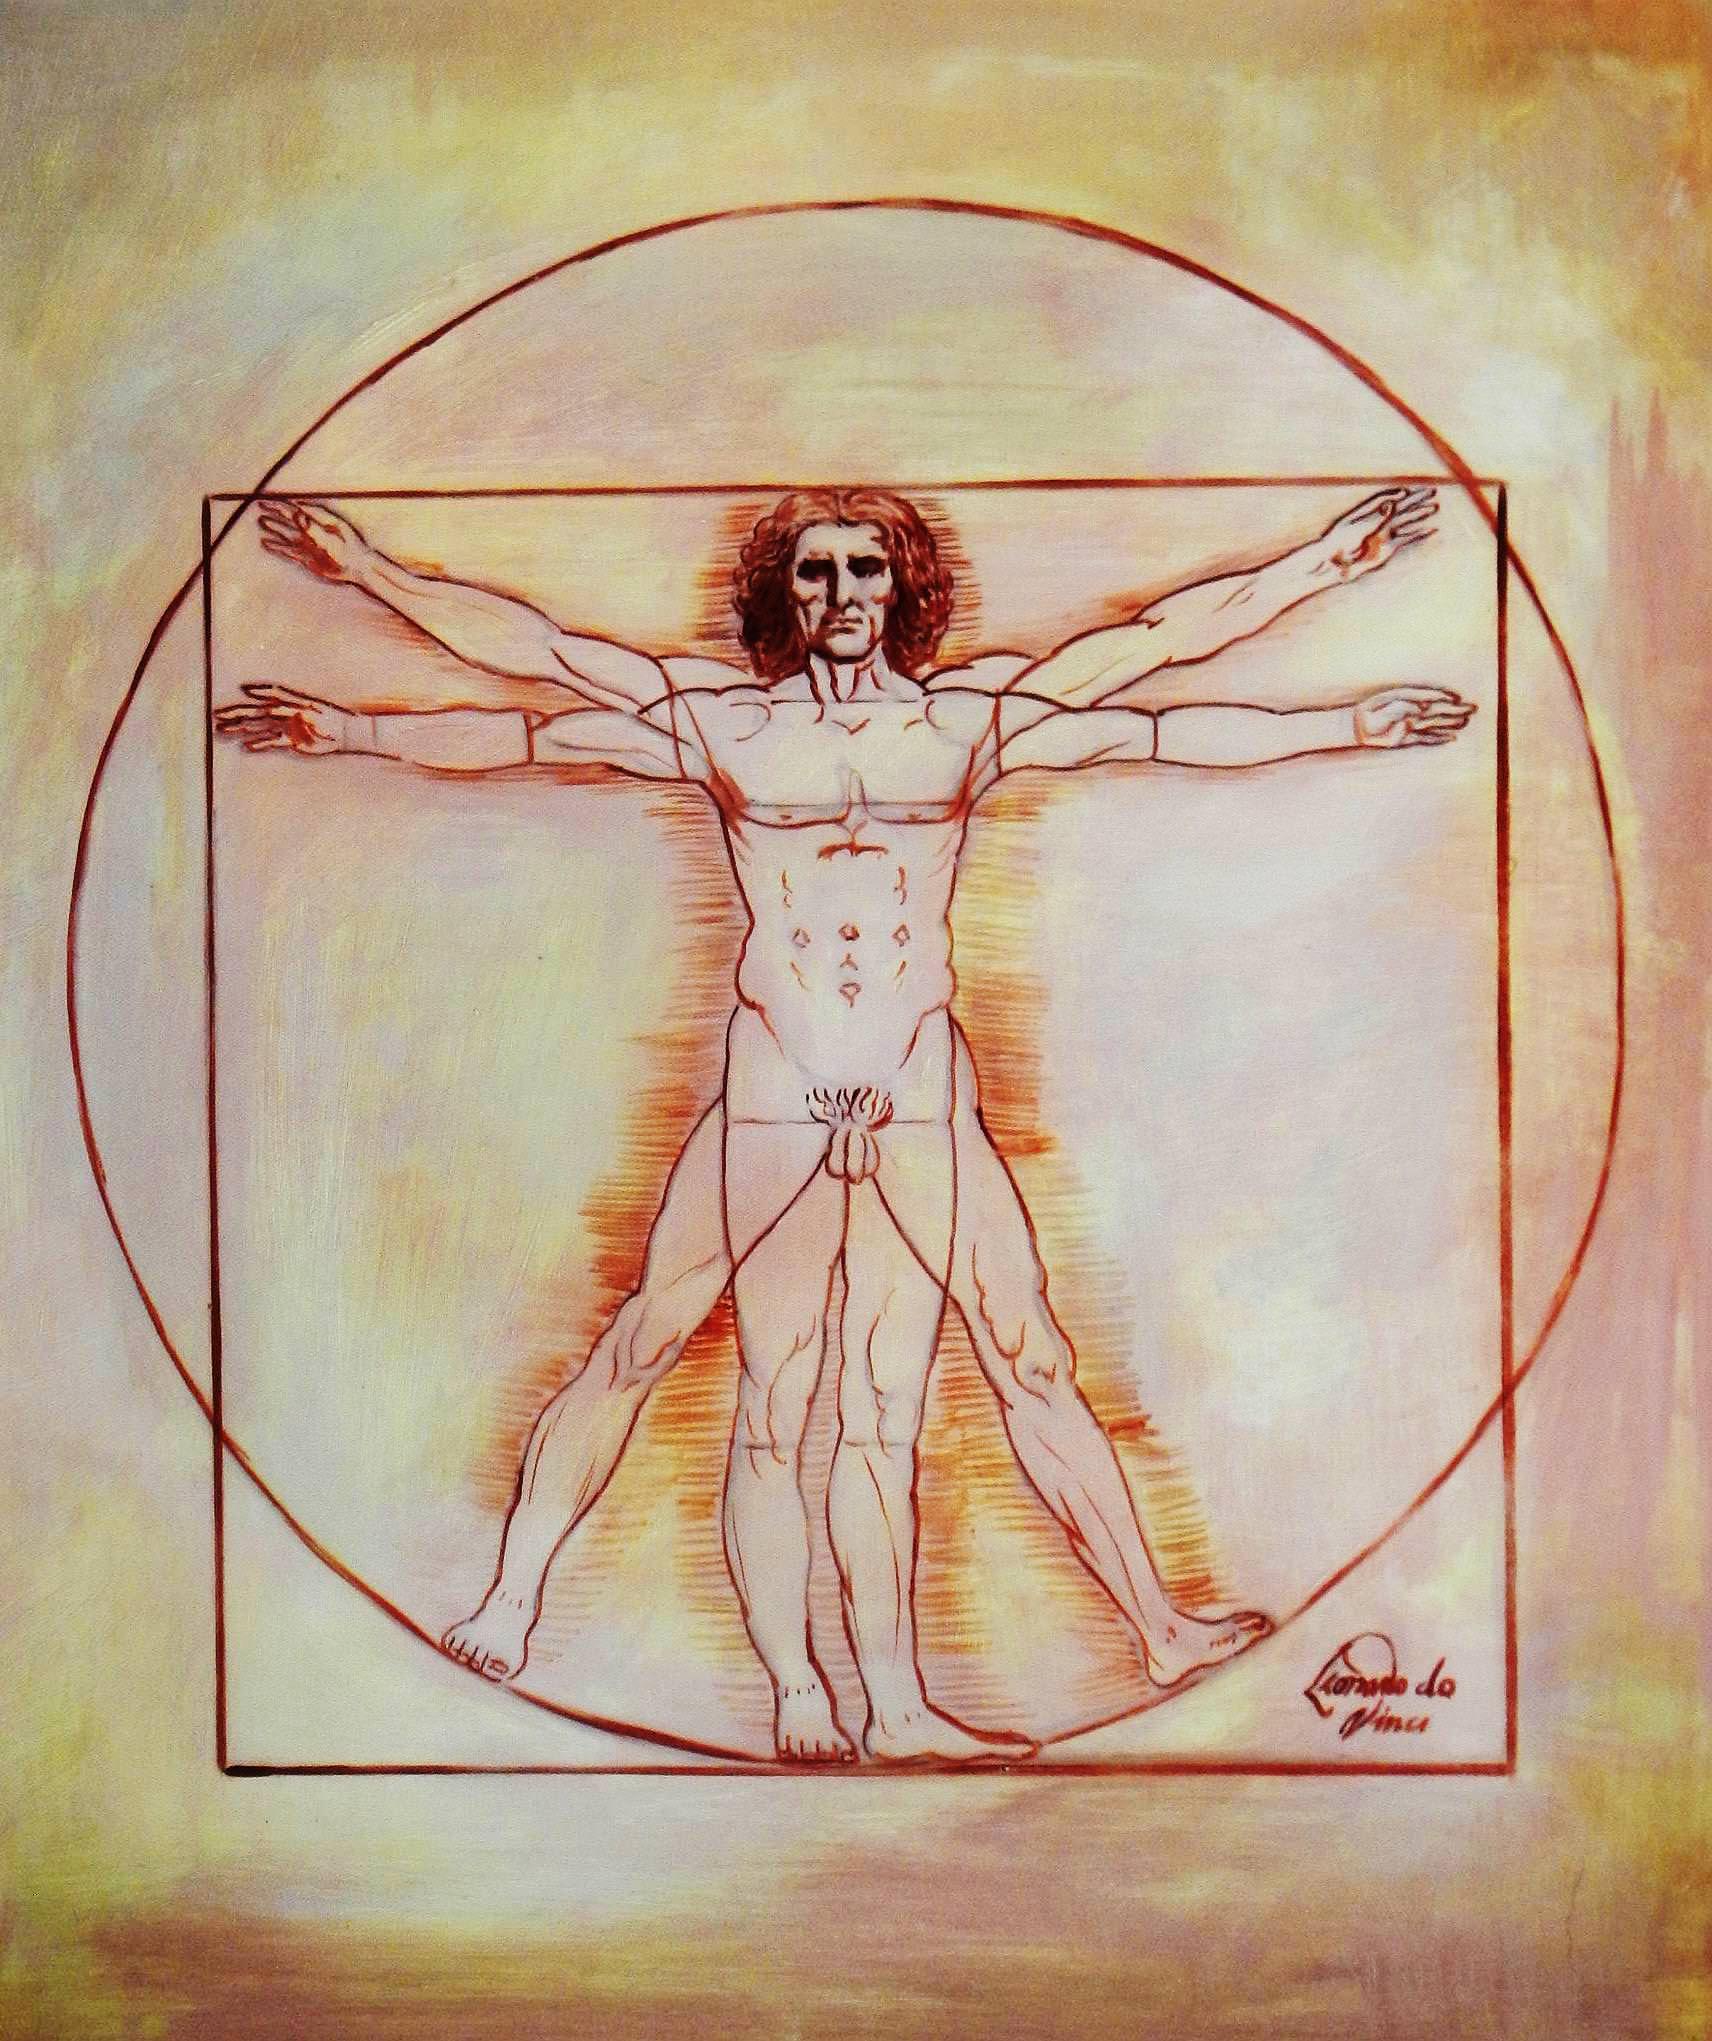 Leonardo da Vinci - Proportionsstudie c93889 50x60cm handgemaltes Ölgemälde